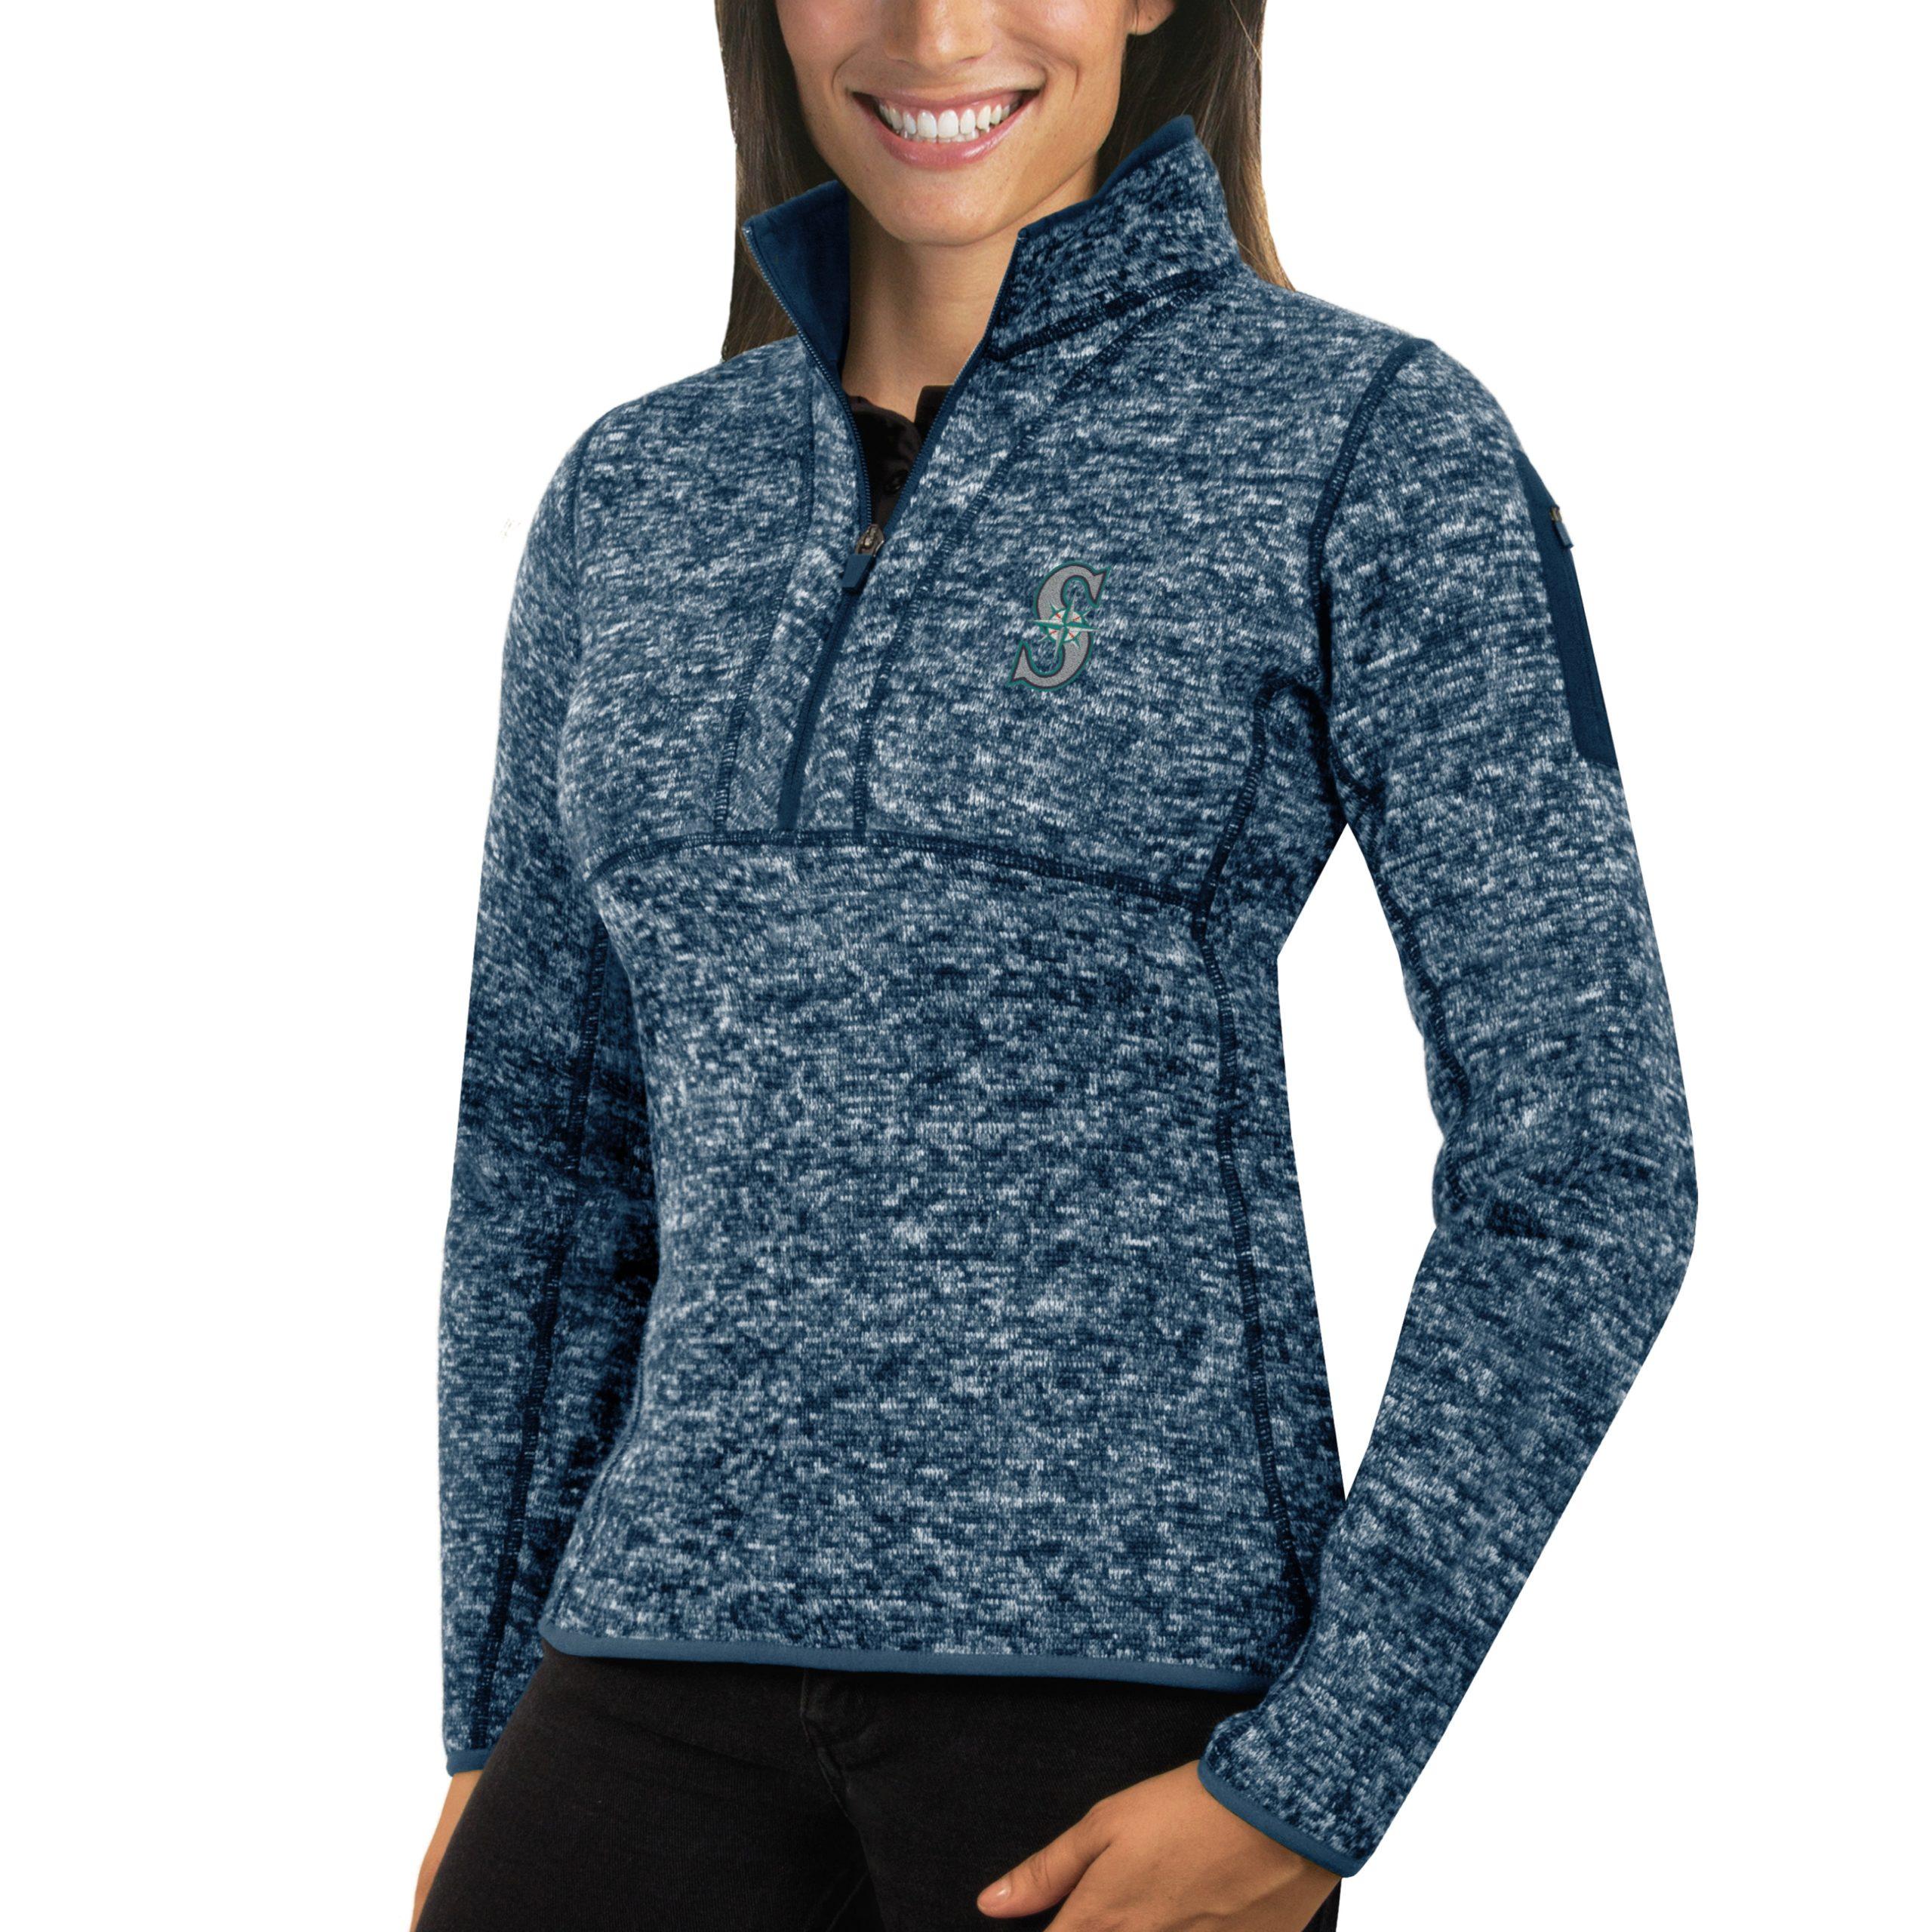 Seattle Mariners Antigua Women's Fortune Half-Zip Pullover Sweater - Heathered Navy